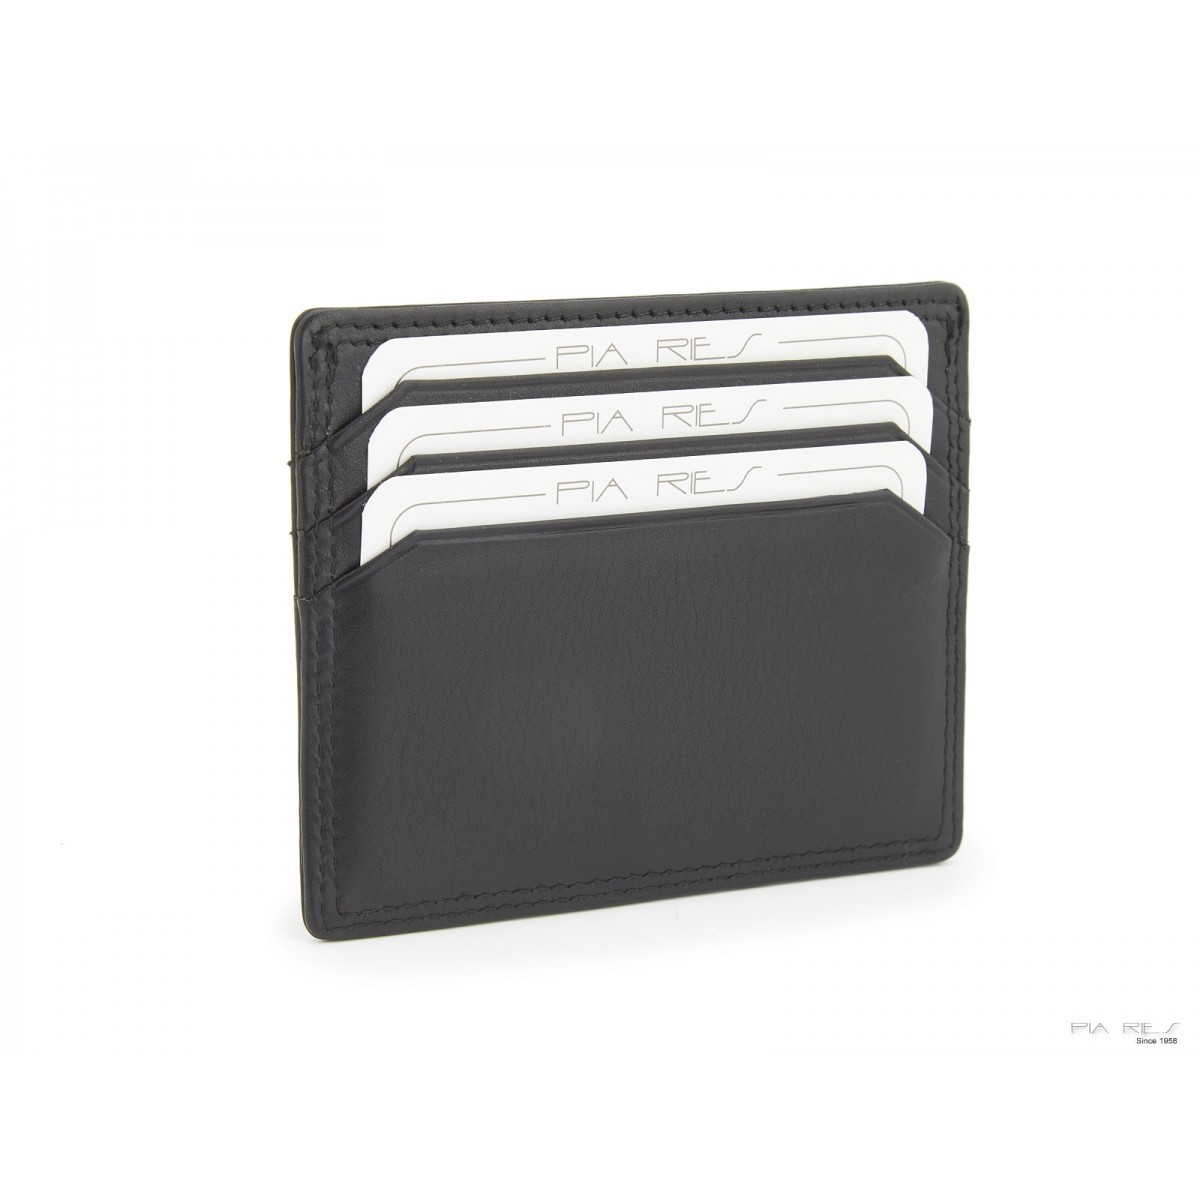 Kreditkort etui med seddelrum-31